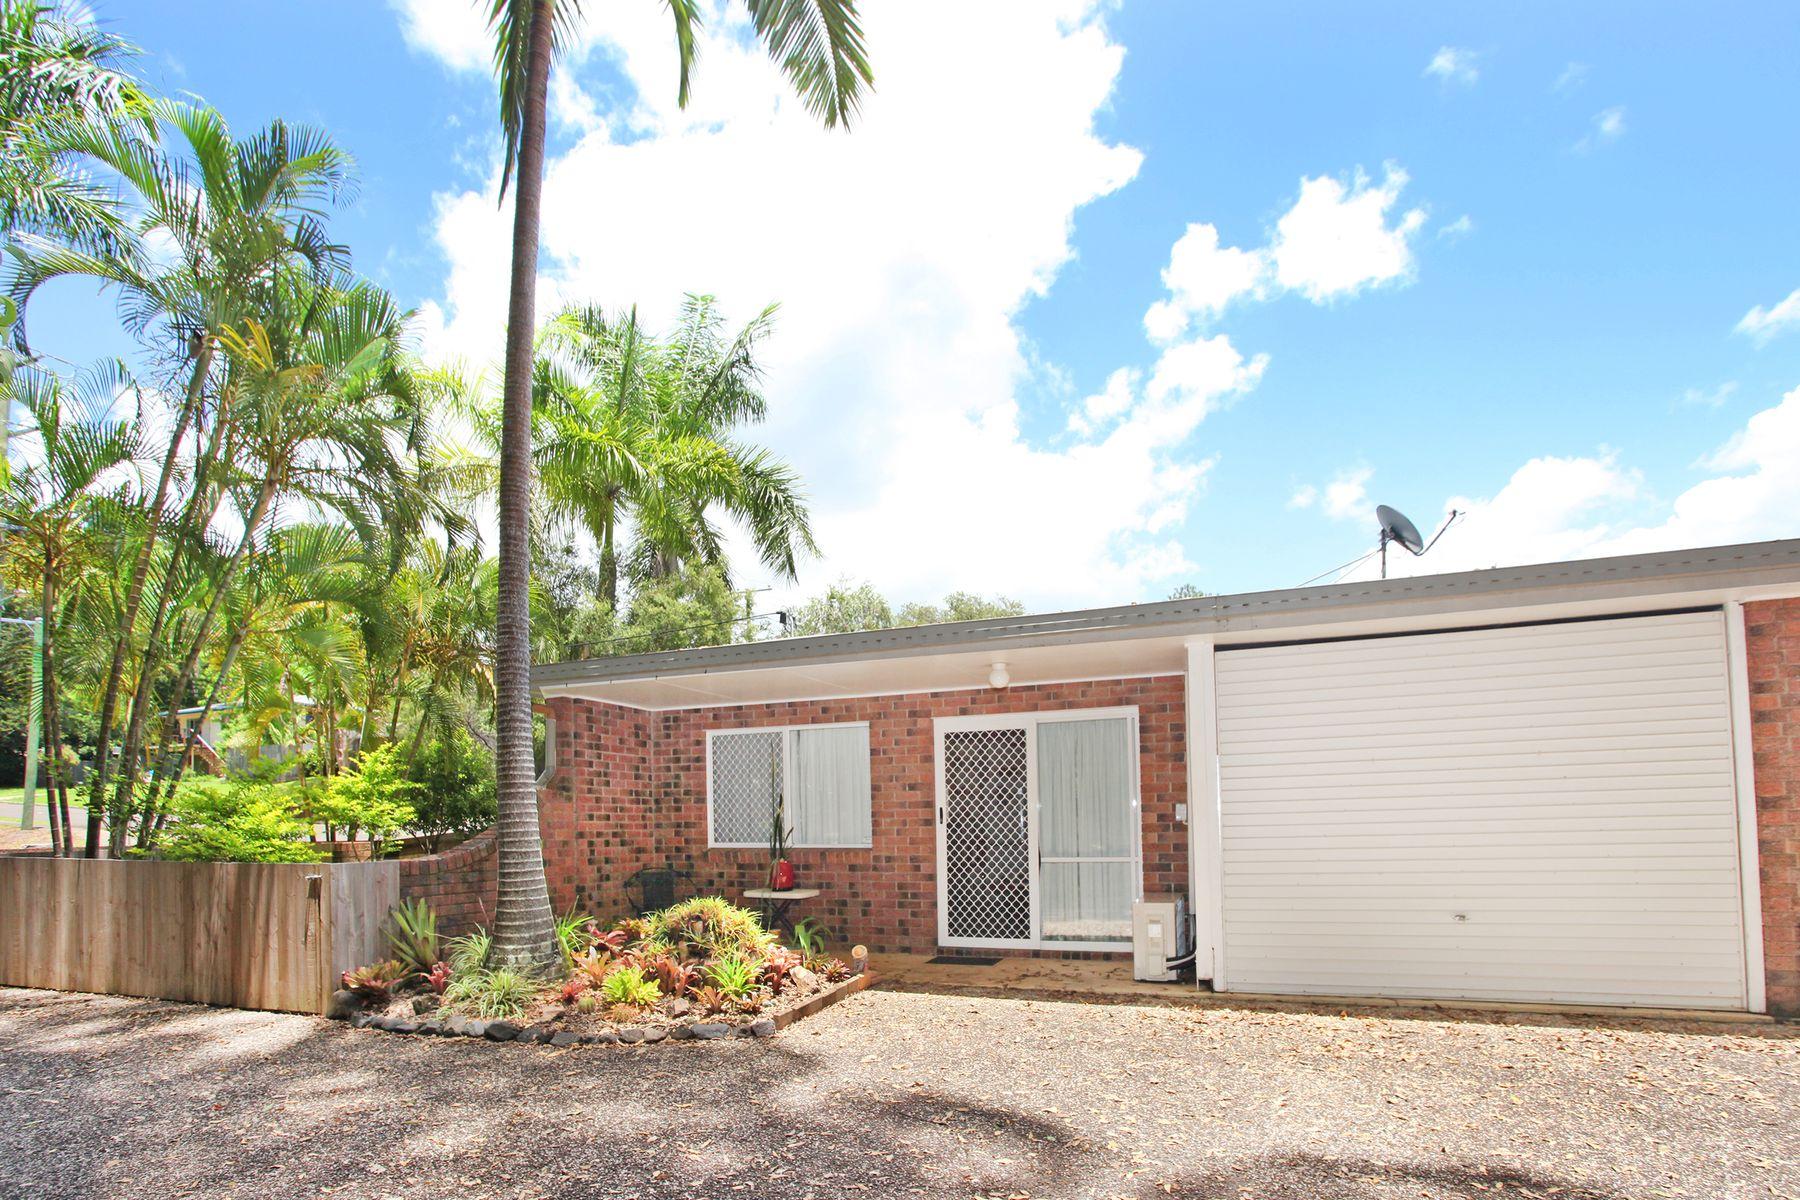 1/47 Park Road, Nambour, QLD 4560